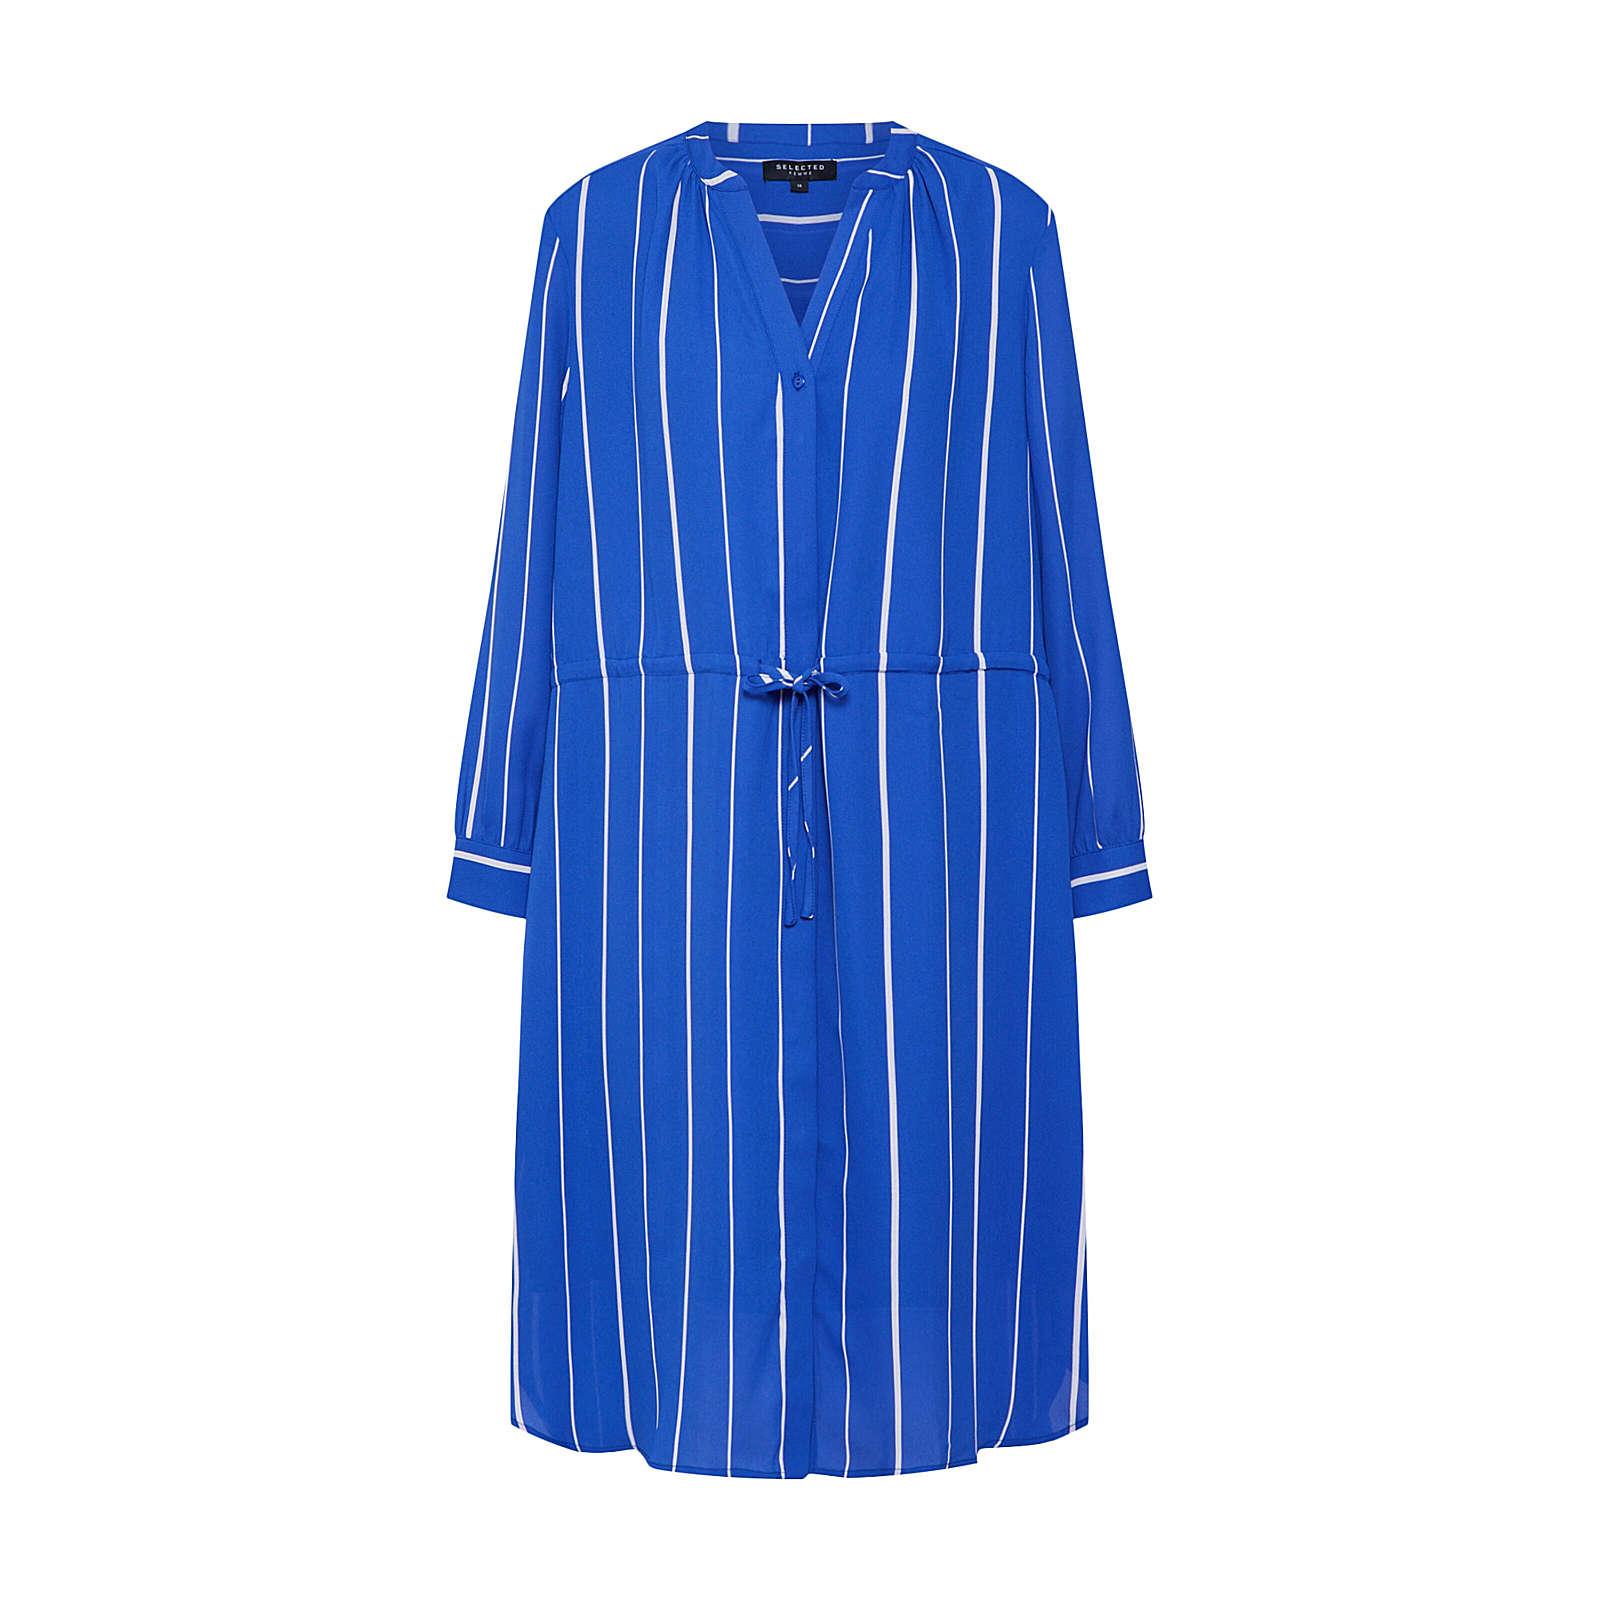 SELECTED FEMME Blusenkleid DAMINA Blusenkleider weiß Damen Gr. 36